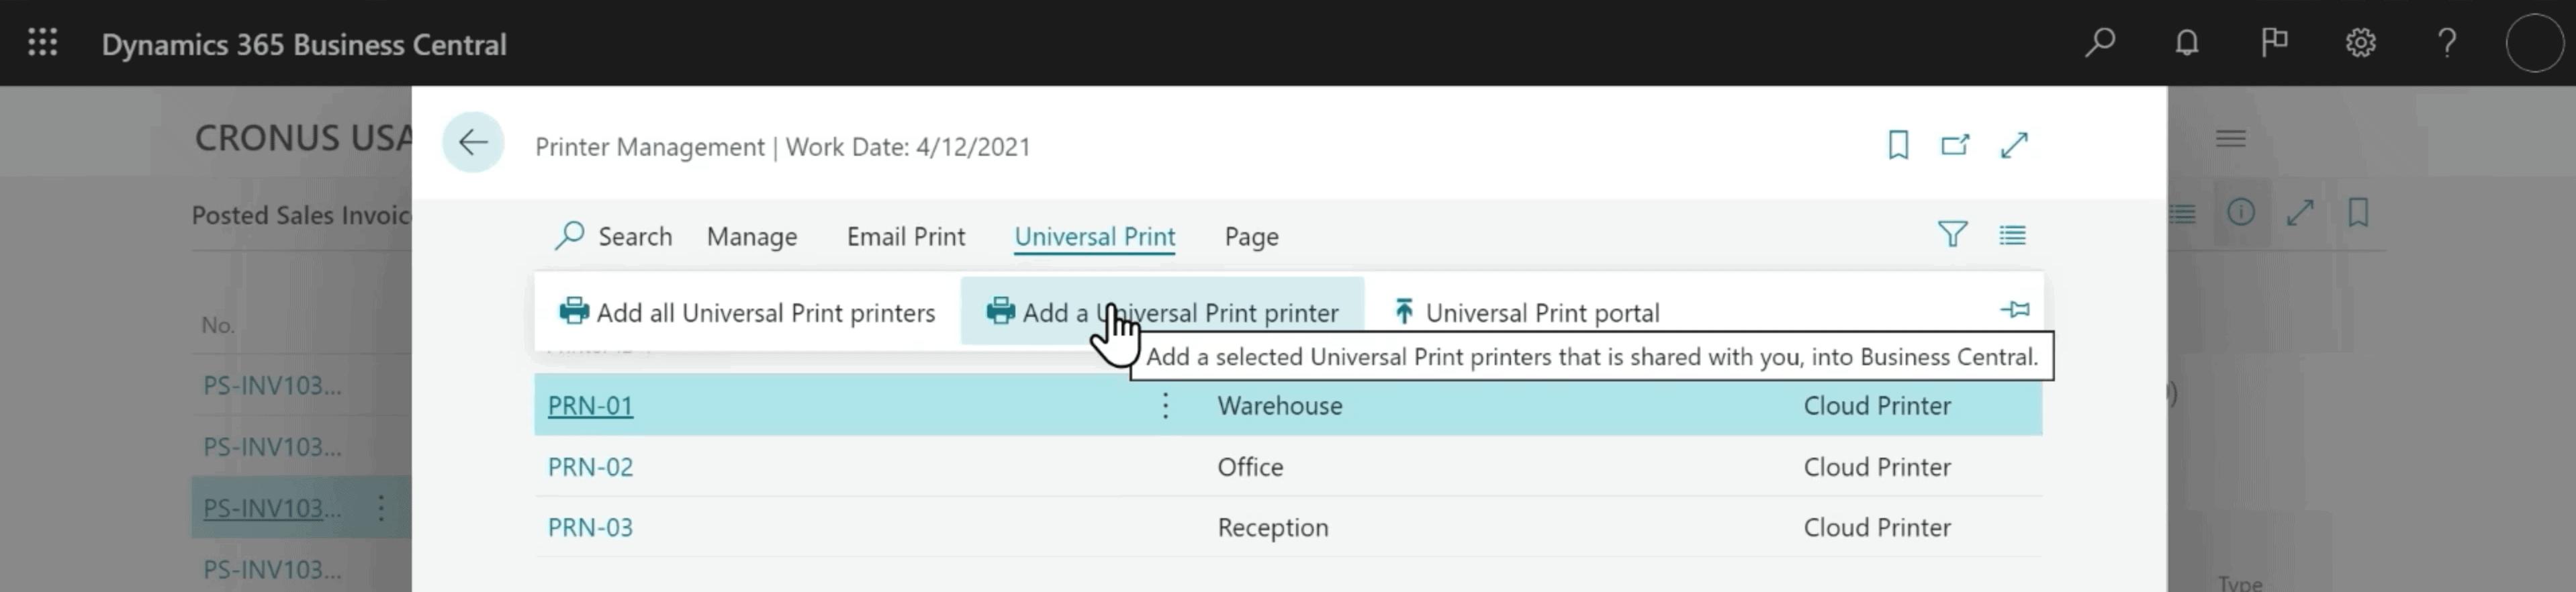 Microsoft Dynamics 365 Business Central Screenshot - Printer Management > Universal Printer